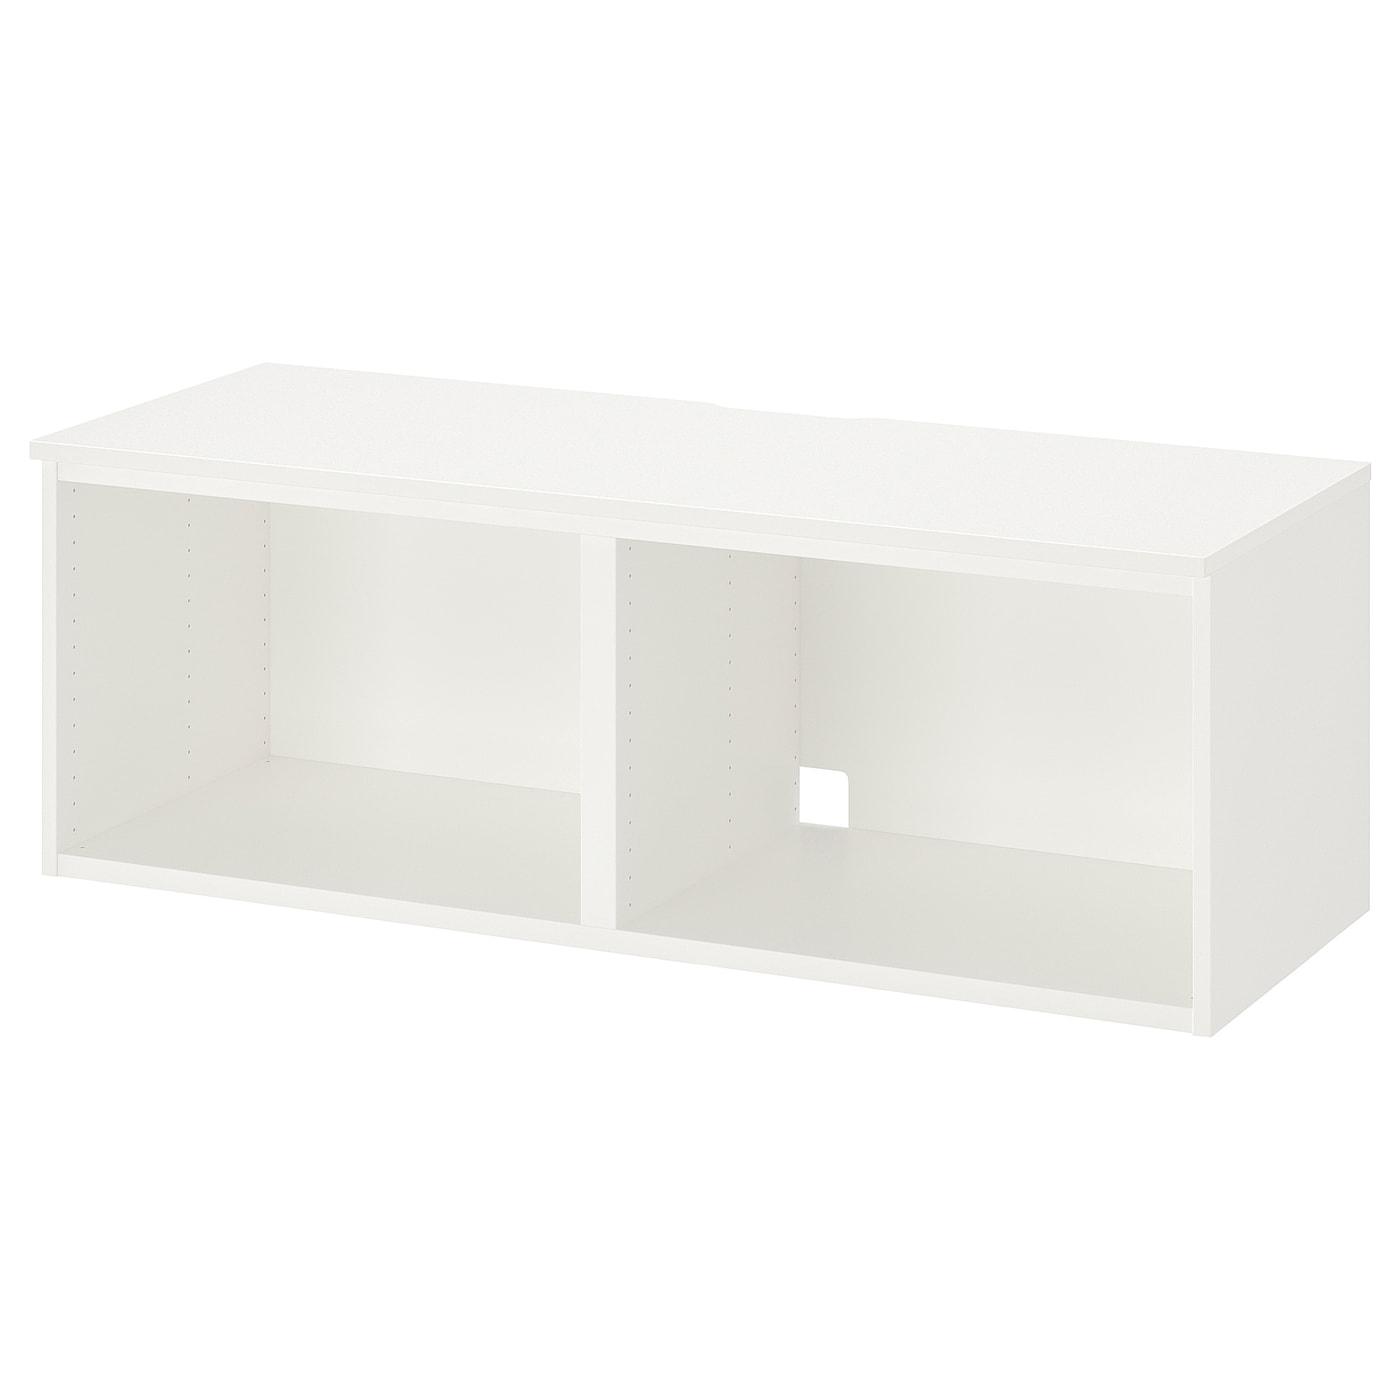 IKEA PLATSA Szafka pod TV, biały, 120x42x42 cm